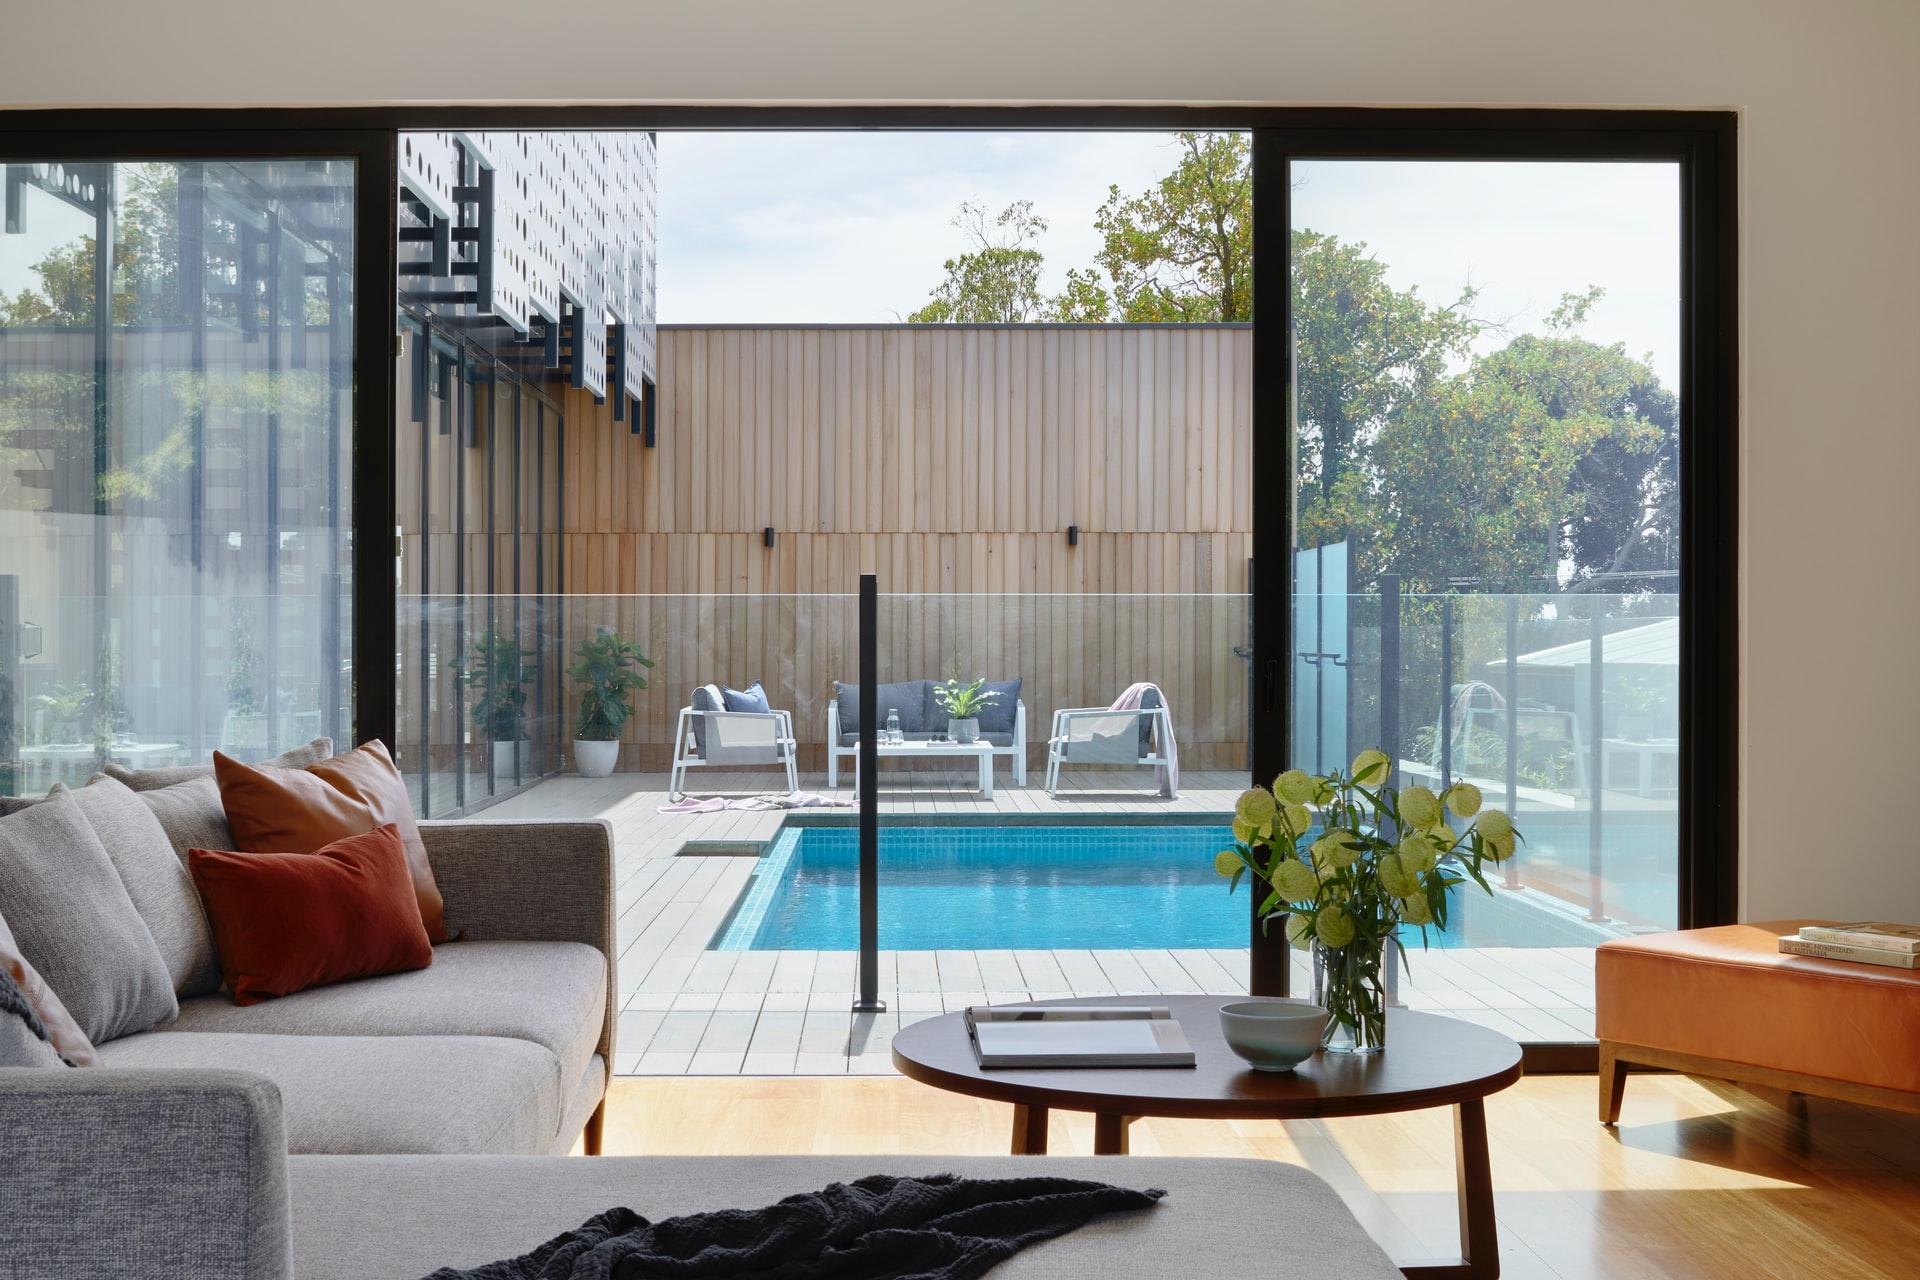 Where to Buy Outdoor Pool Railings